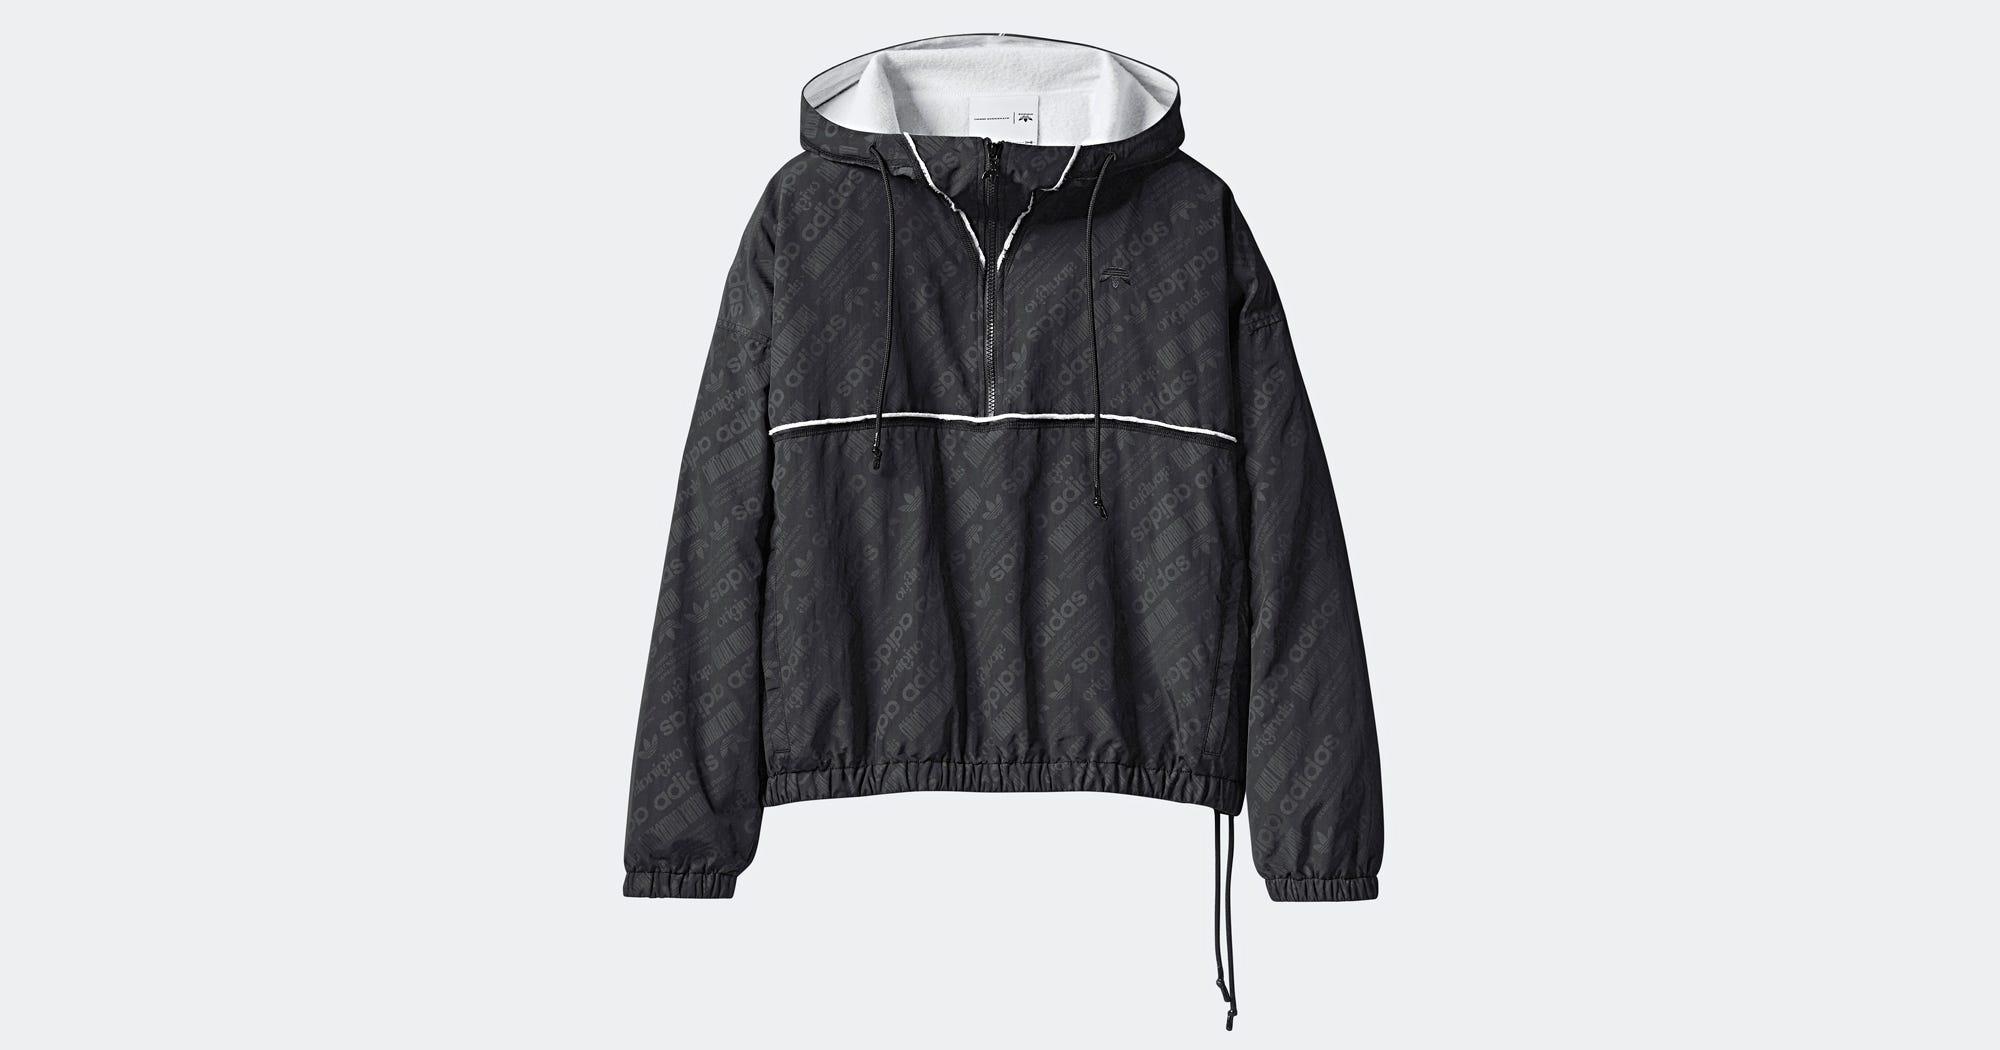 98d91d7406 Adidas Alexander Wang Collaboration New Sneaker Styles